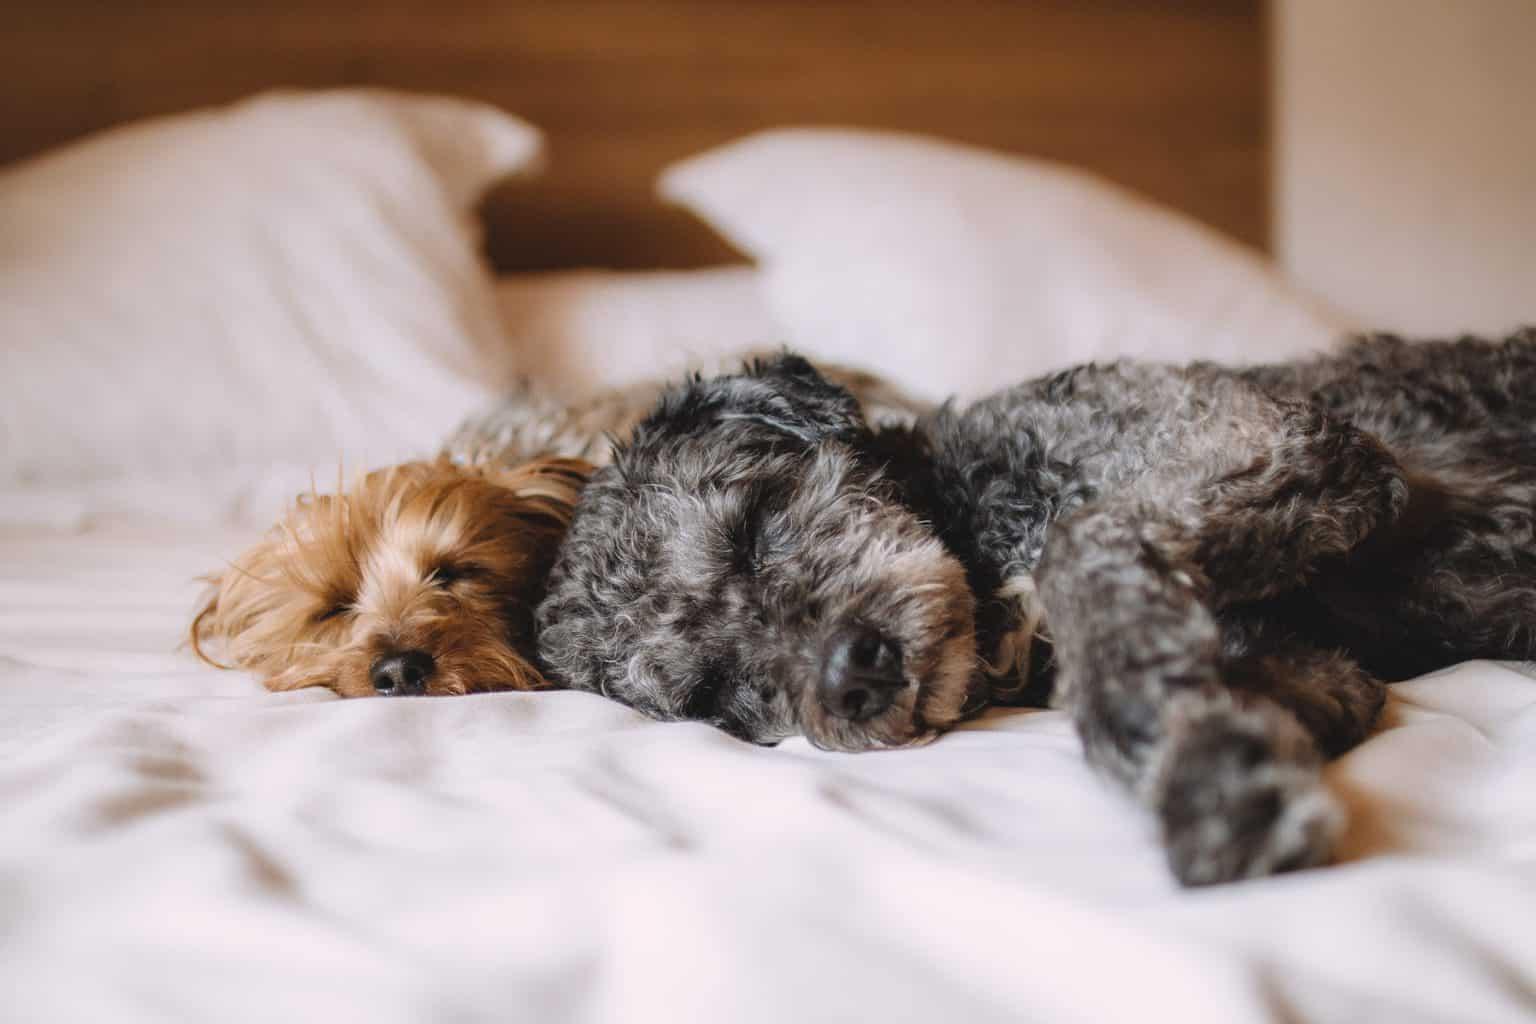 Micro-Habits to Reduce Stress: Get Quality Sleep